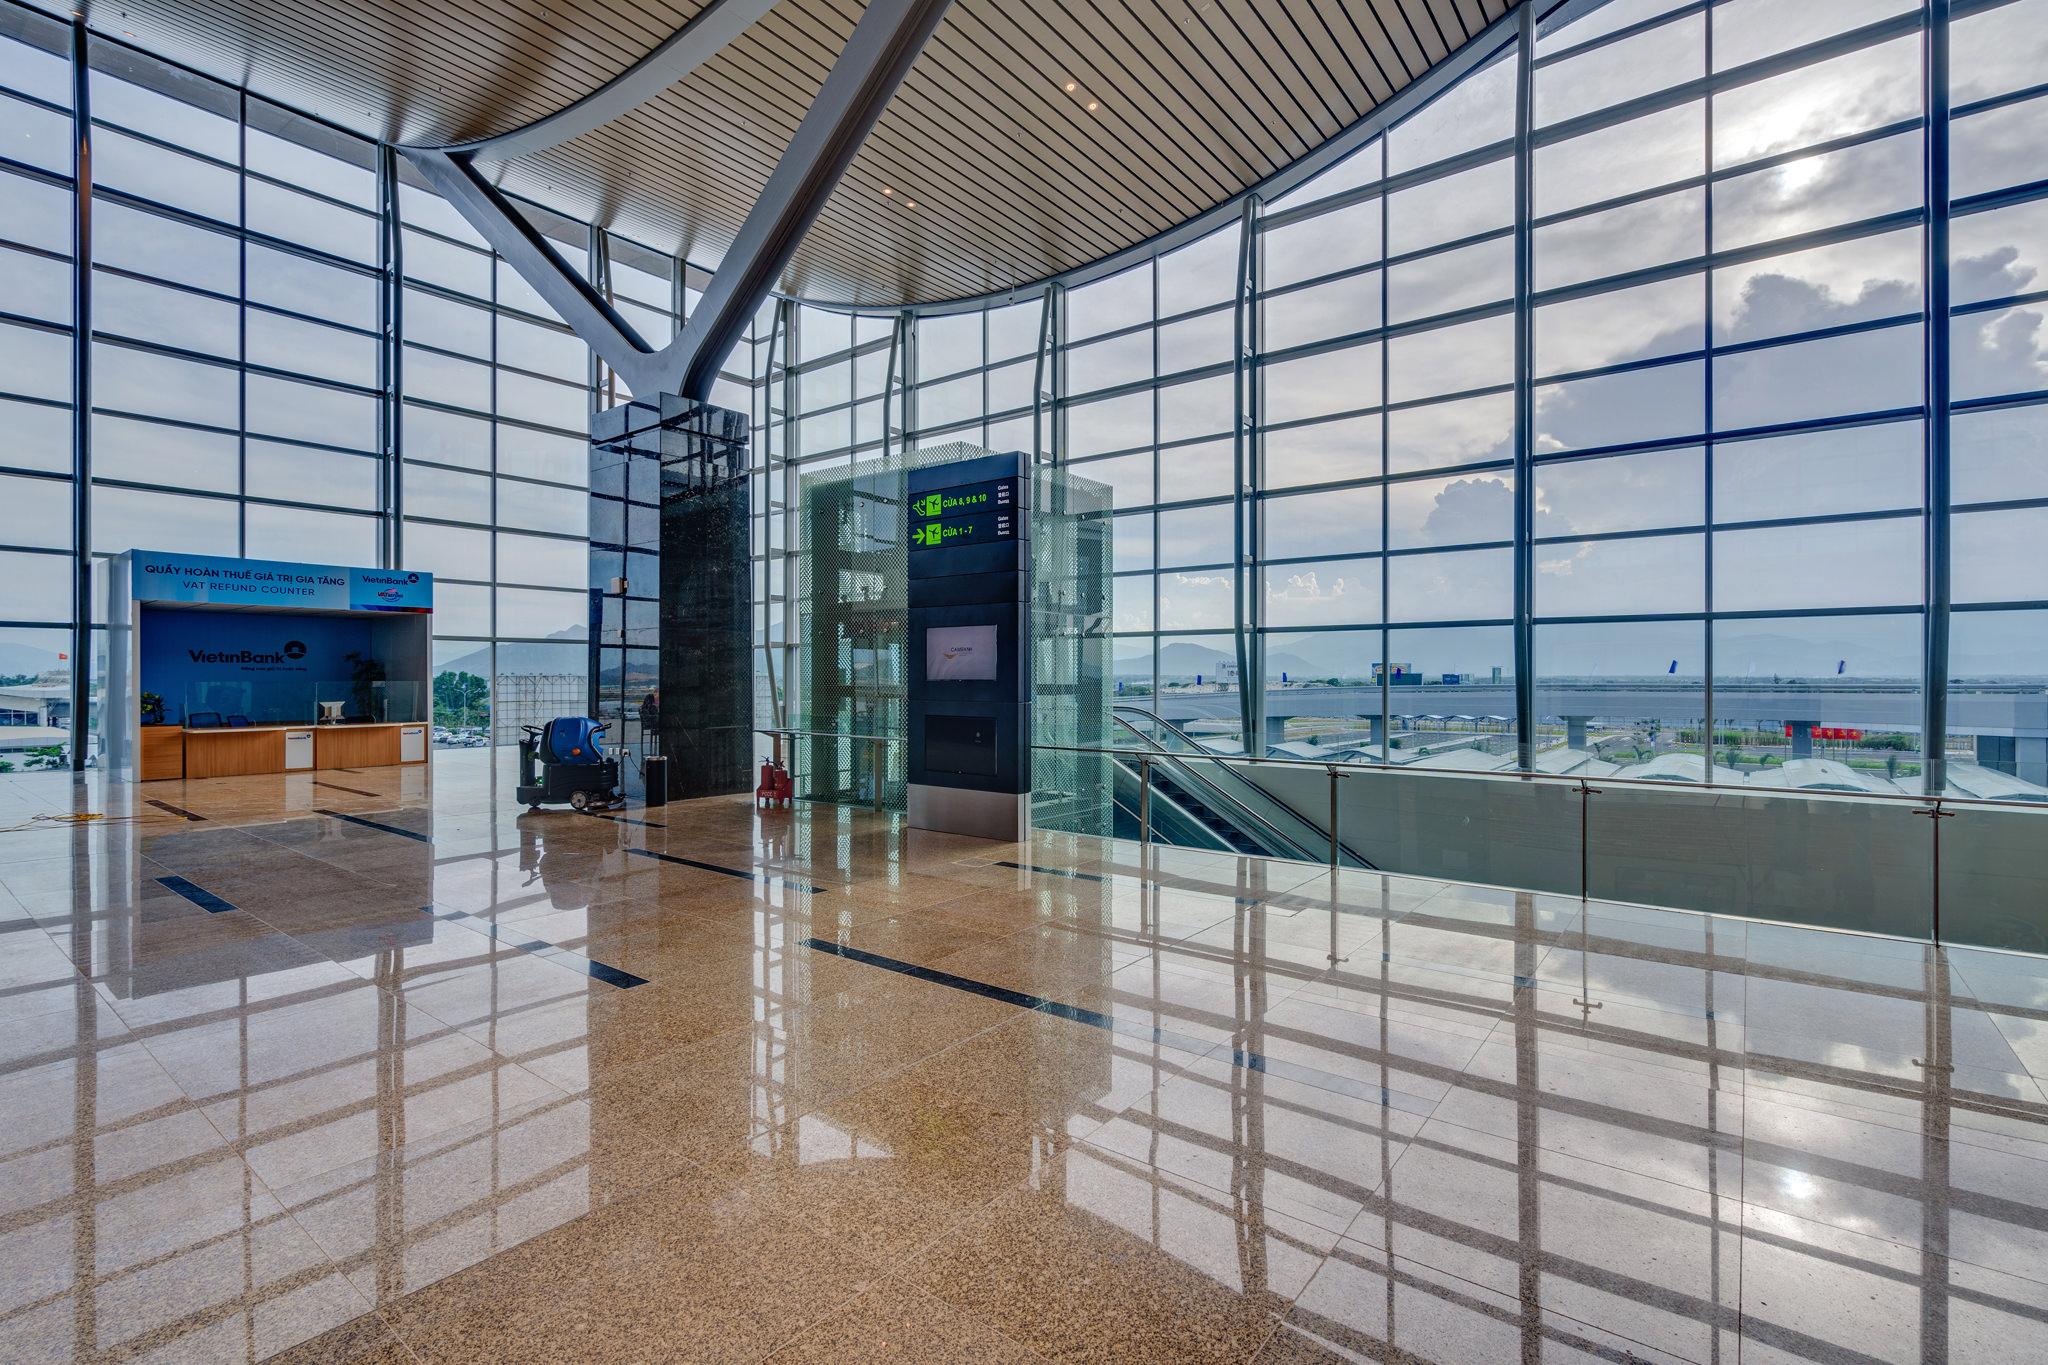 20180626 - Cam Ranh Airport - Architecture - 0344.jpg